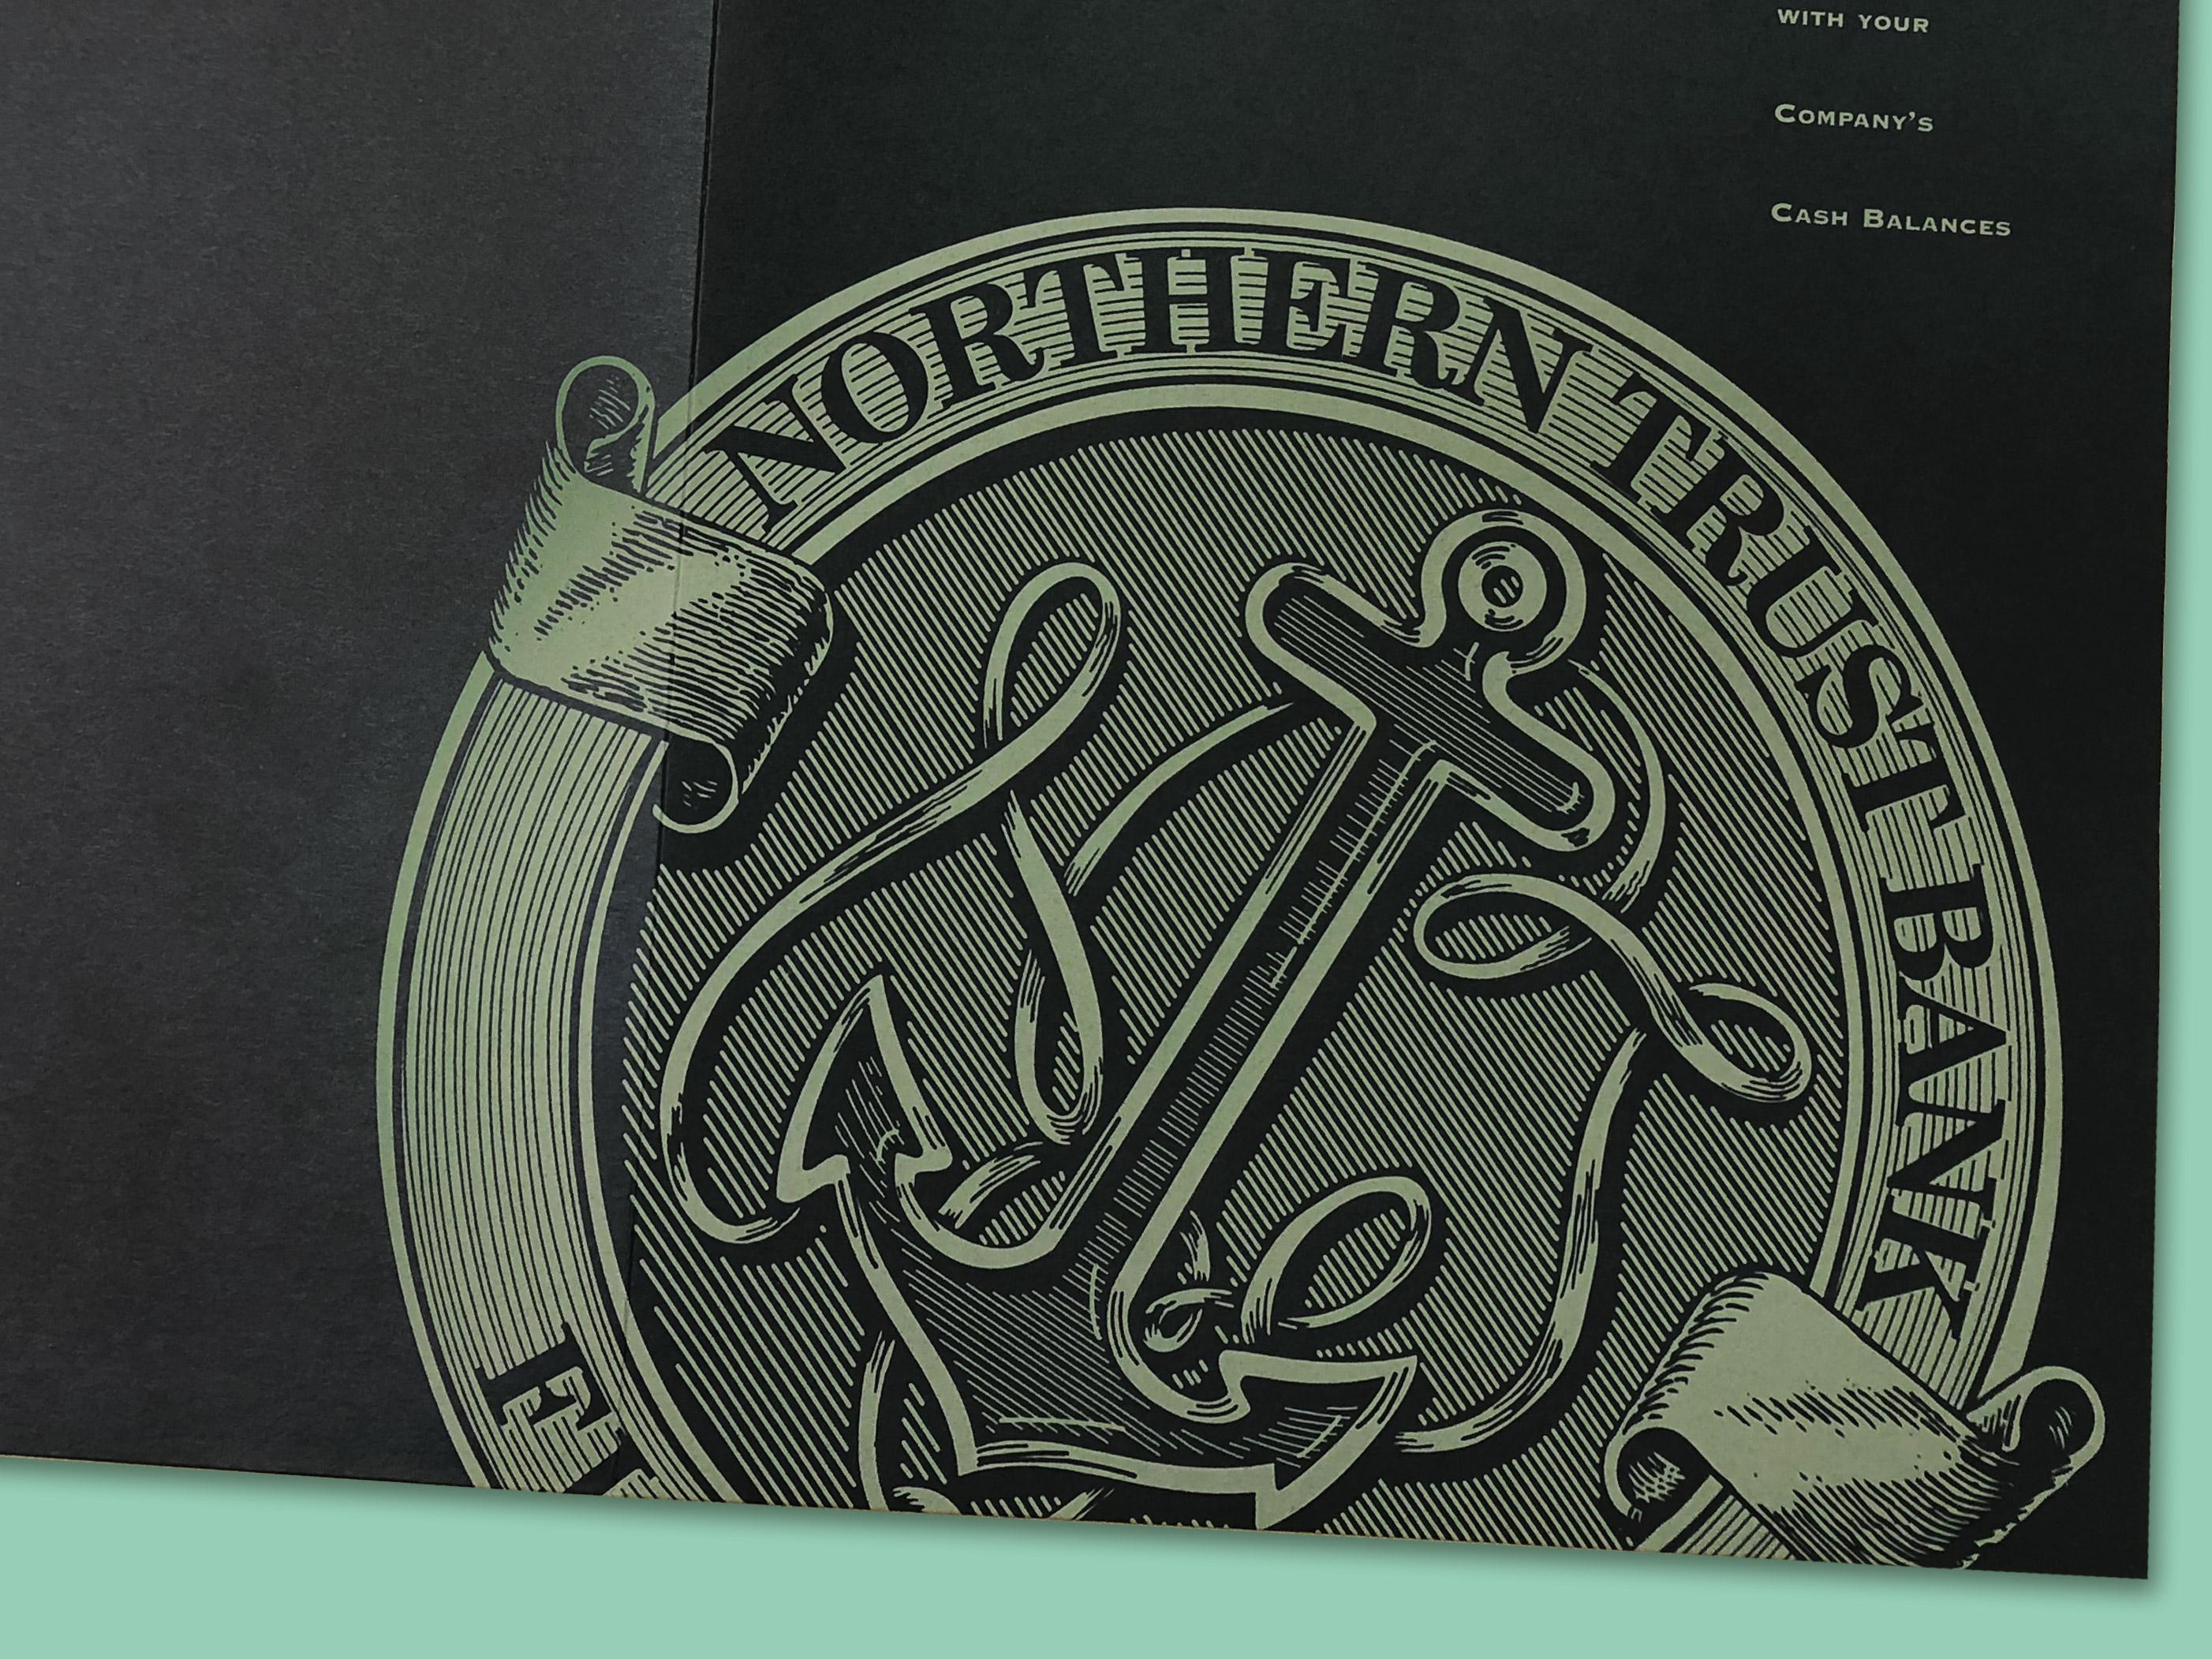 Northern Trust folder Miami Marketing Campaign